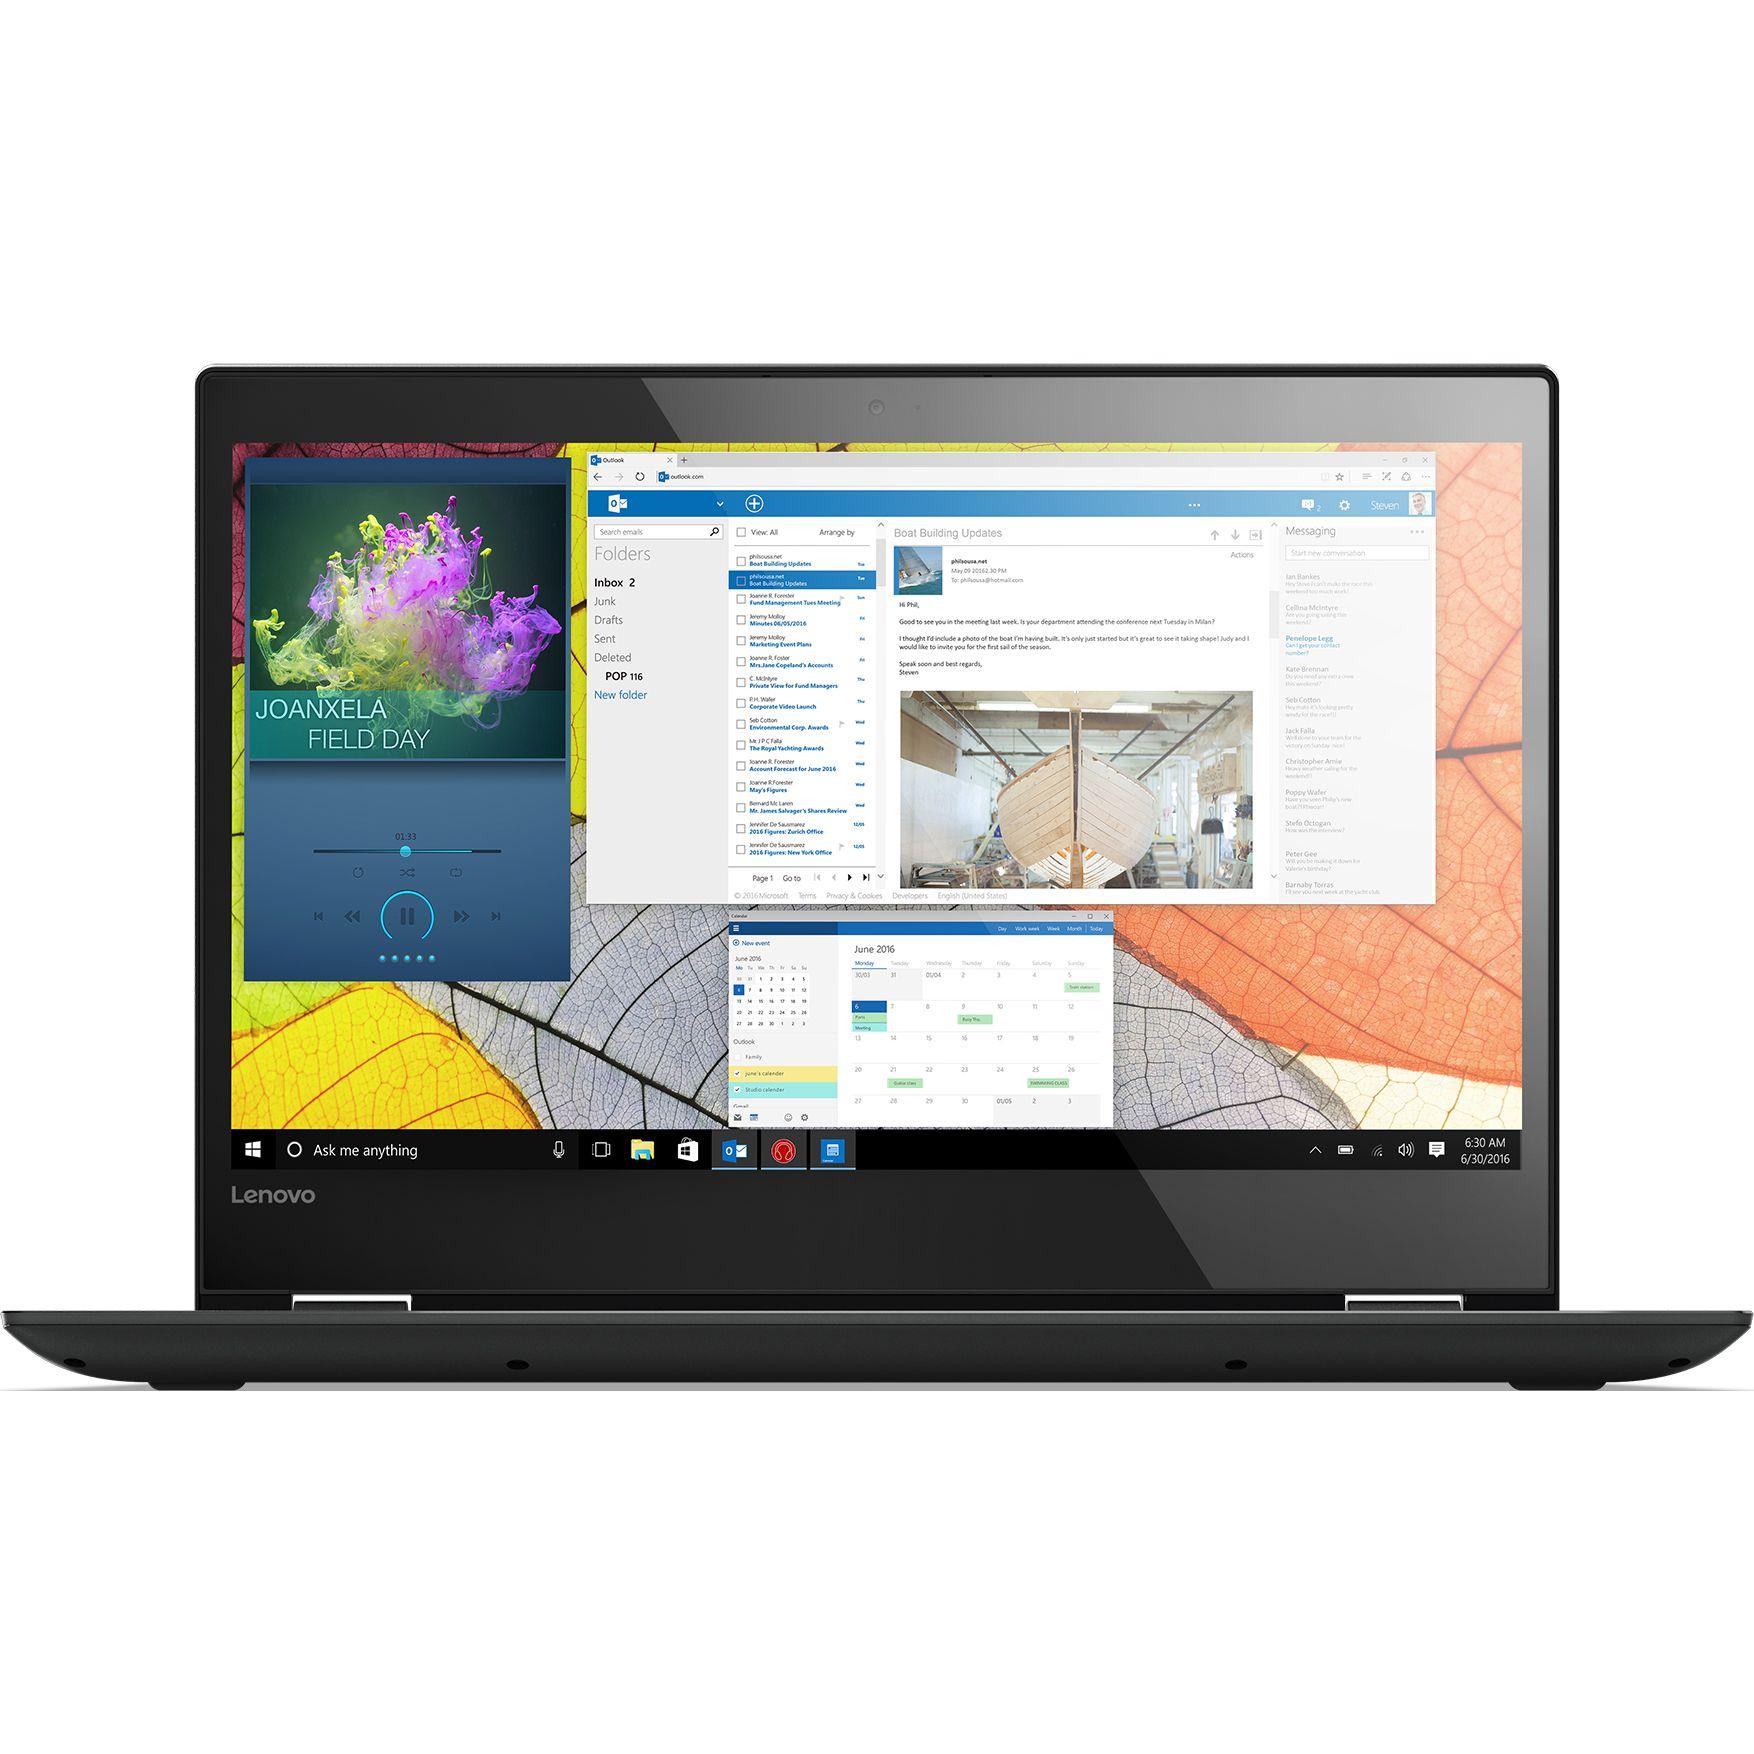 Ultrabook Lenovo Yoga 520 14 Full HD Touch Intel Core i3-7130U RAM 8GB HDD 1TB + SSD 128GB Windows 10 Home Negru